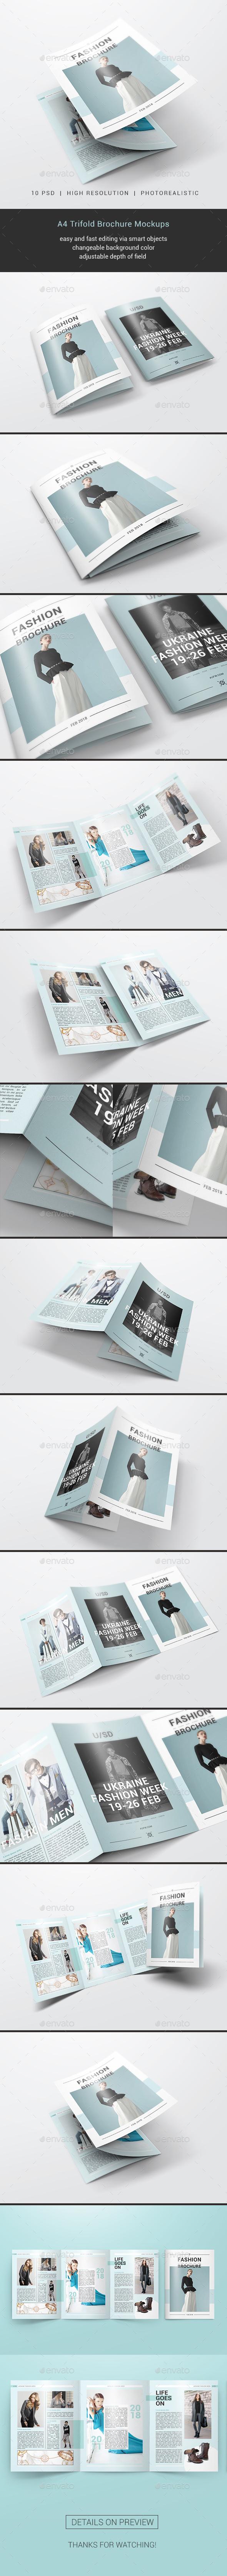 A4 Trifold Brochure Mockups - Brochures Print